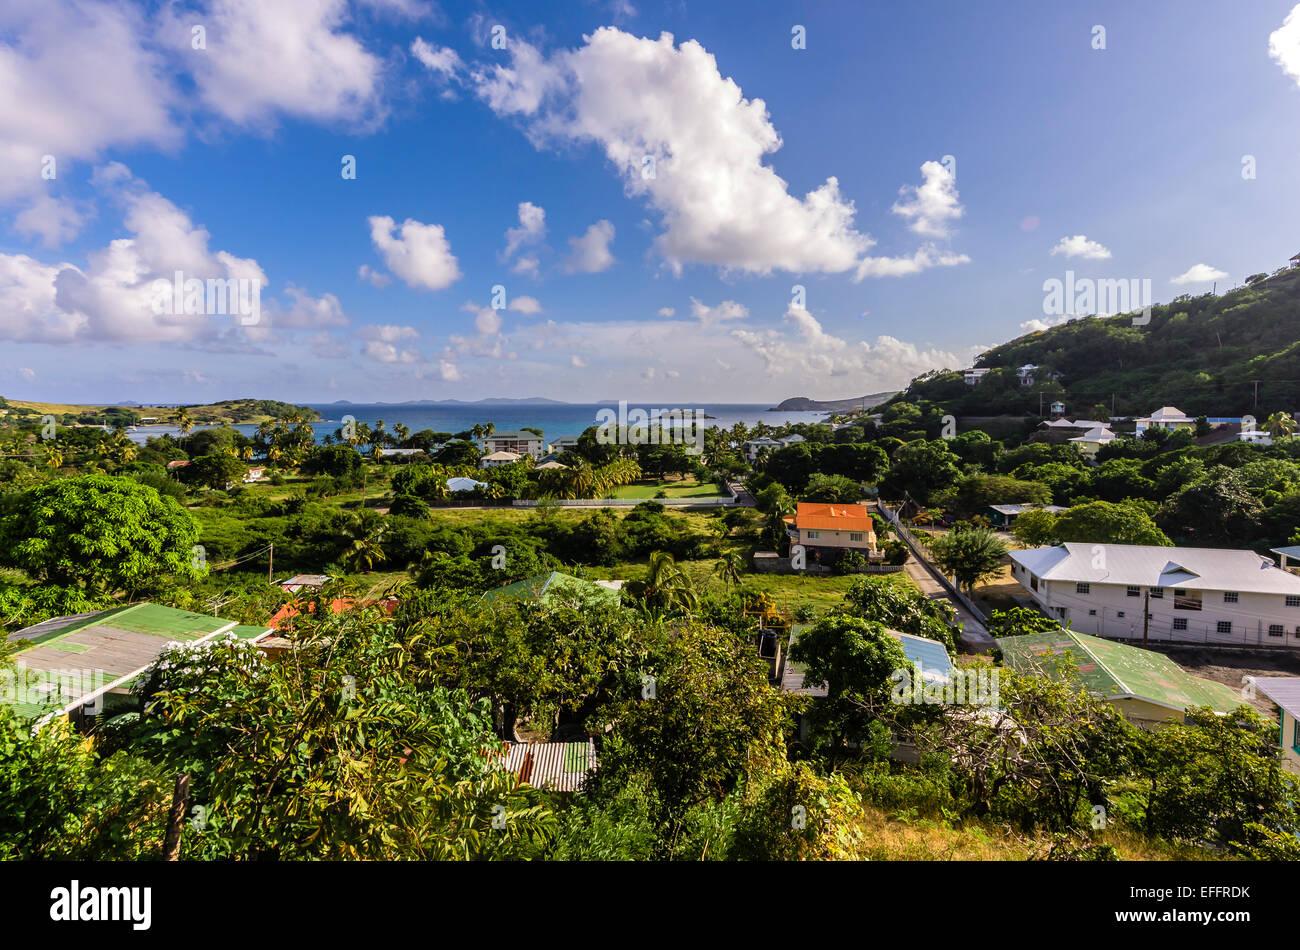 Karibik, Antillen, kleine Antillen, Grenadinen Bequia, Stockbild